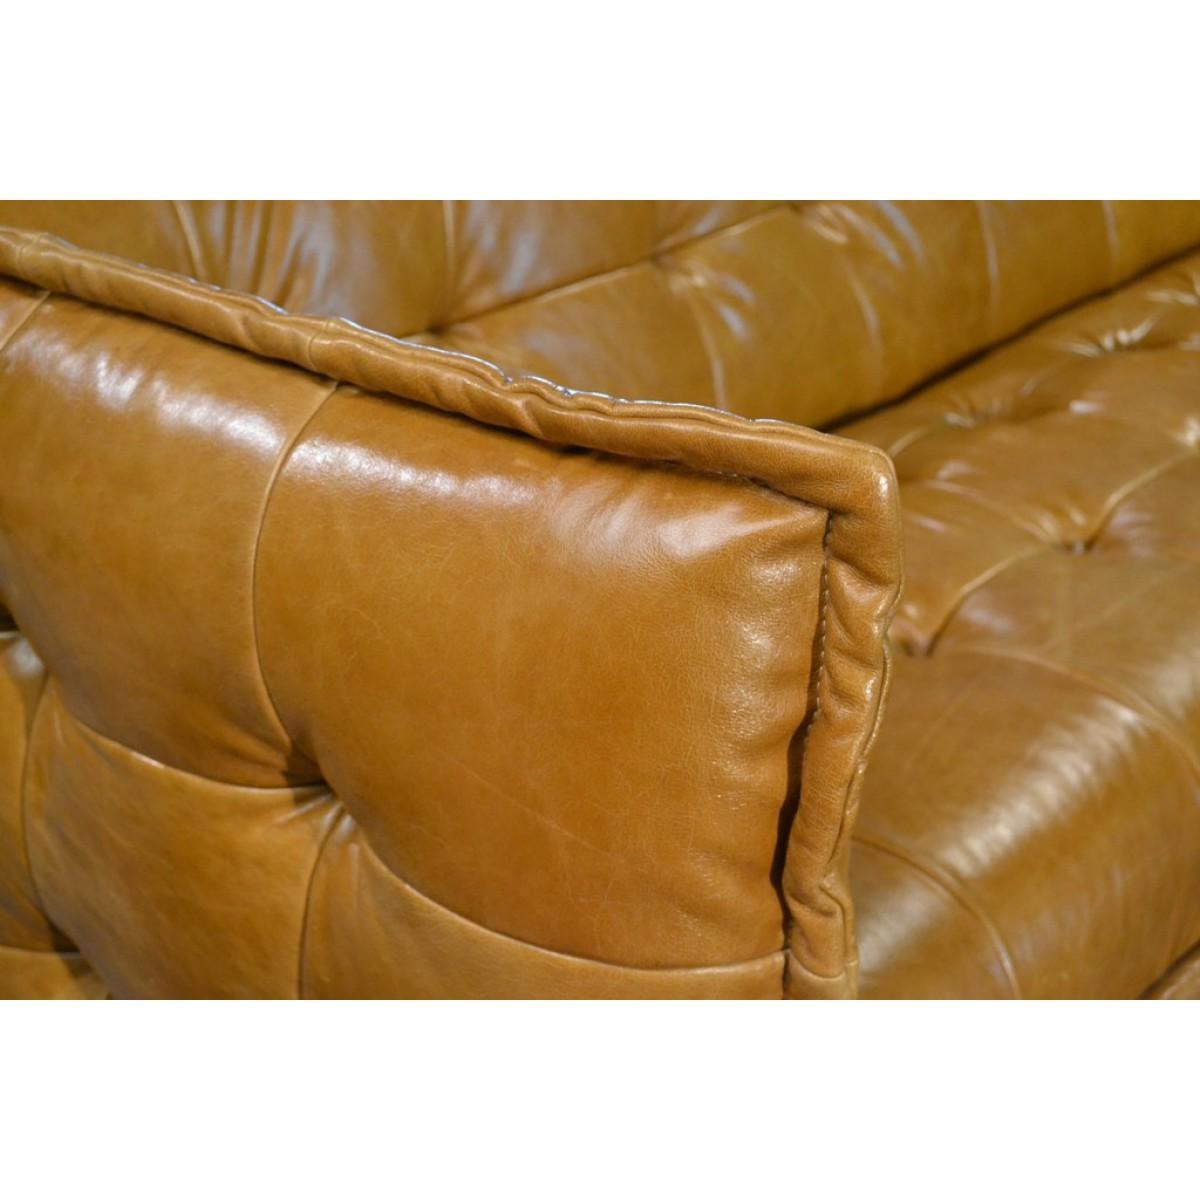 bank_slimm_jim_patch_work_leder_leer_da_silva_tabacco_cognac_tom_club_easy_sofa_detail_arm